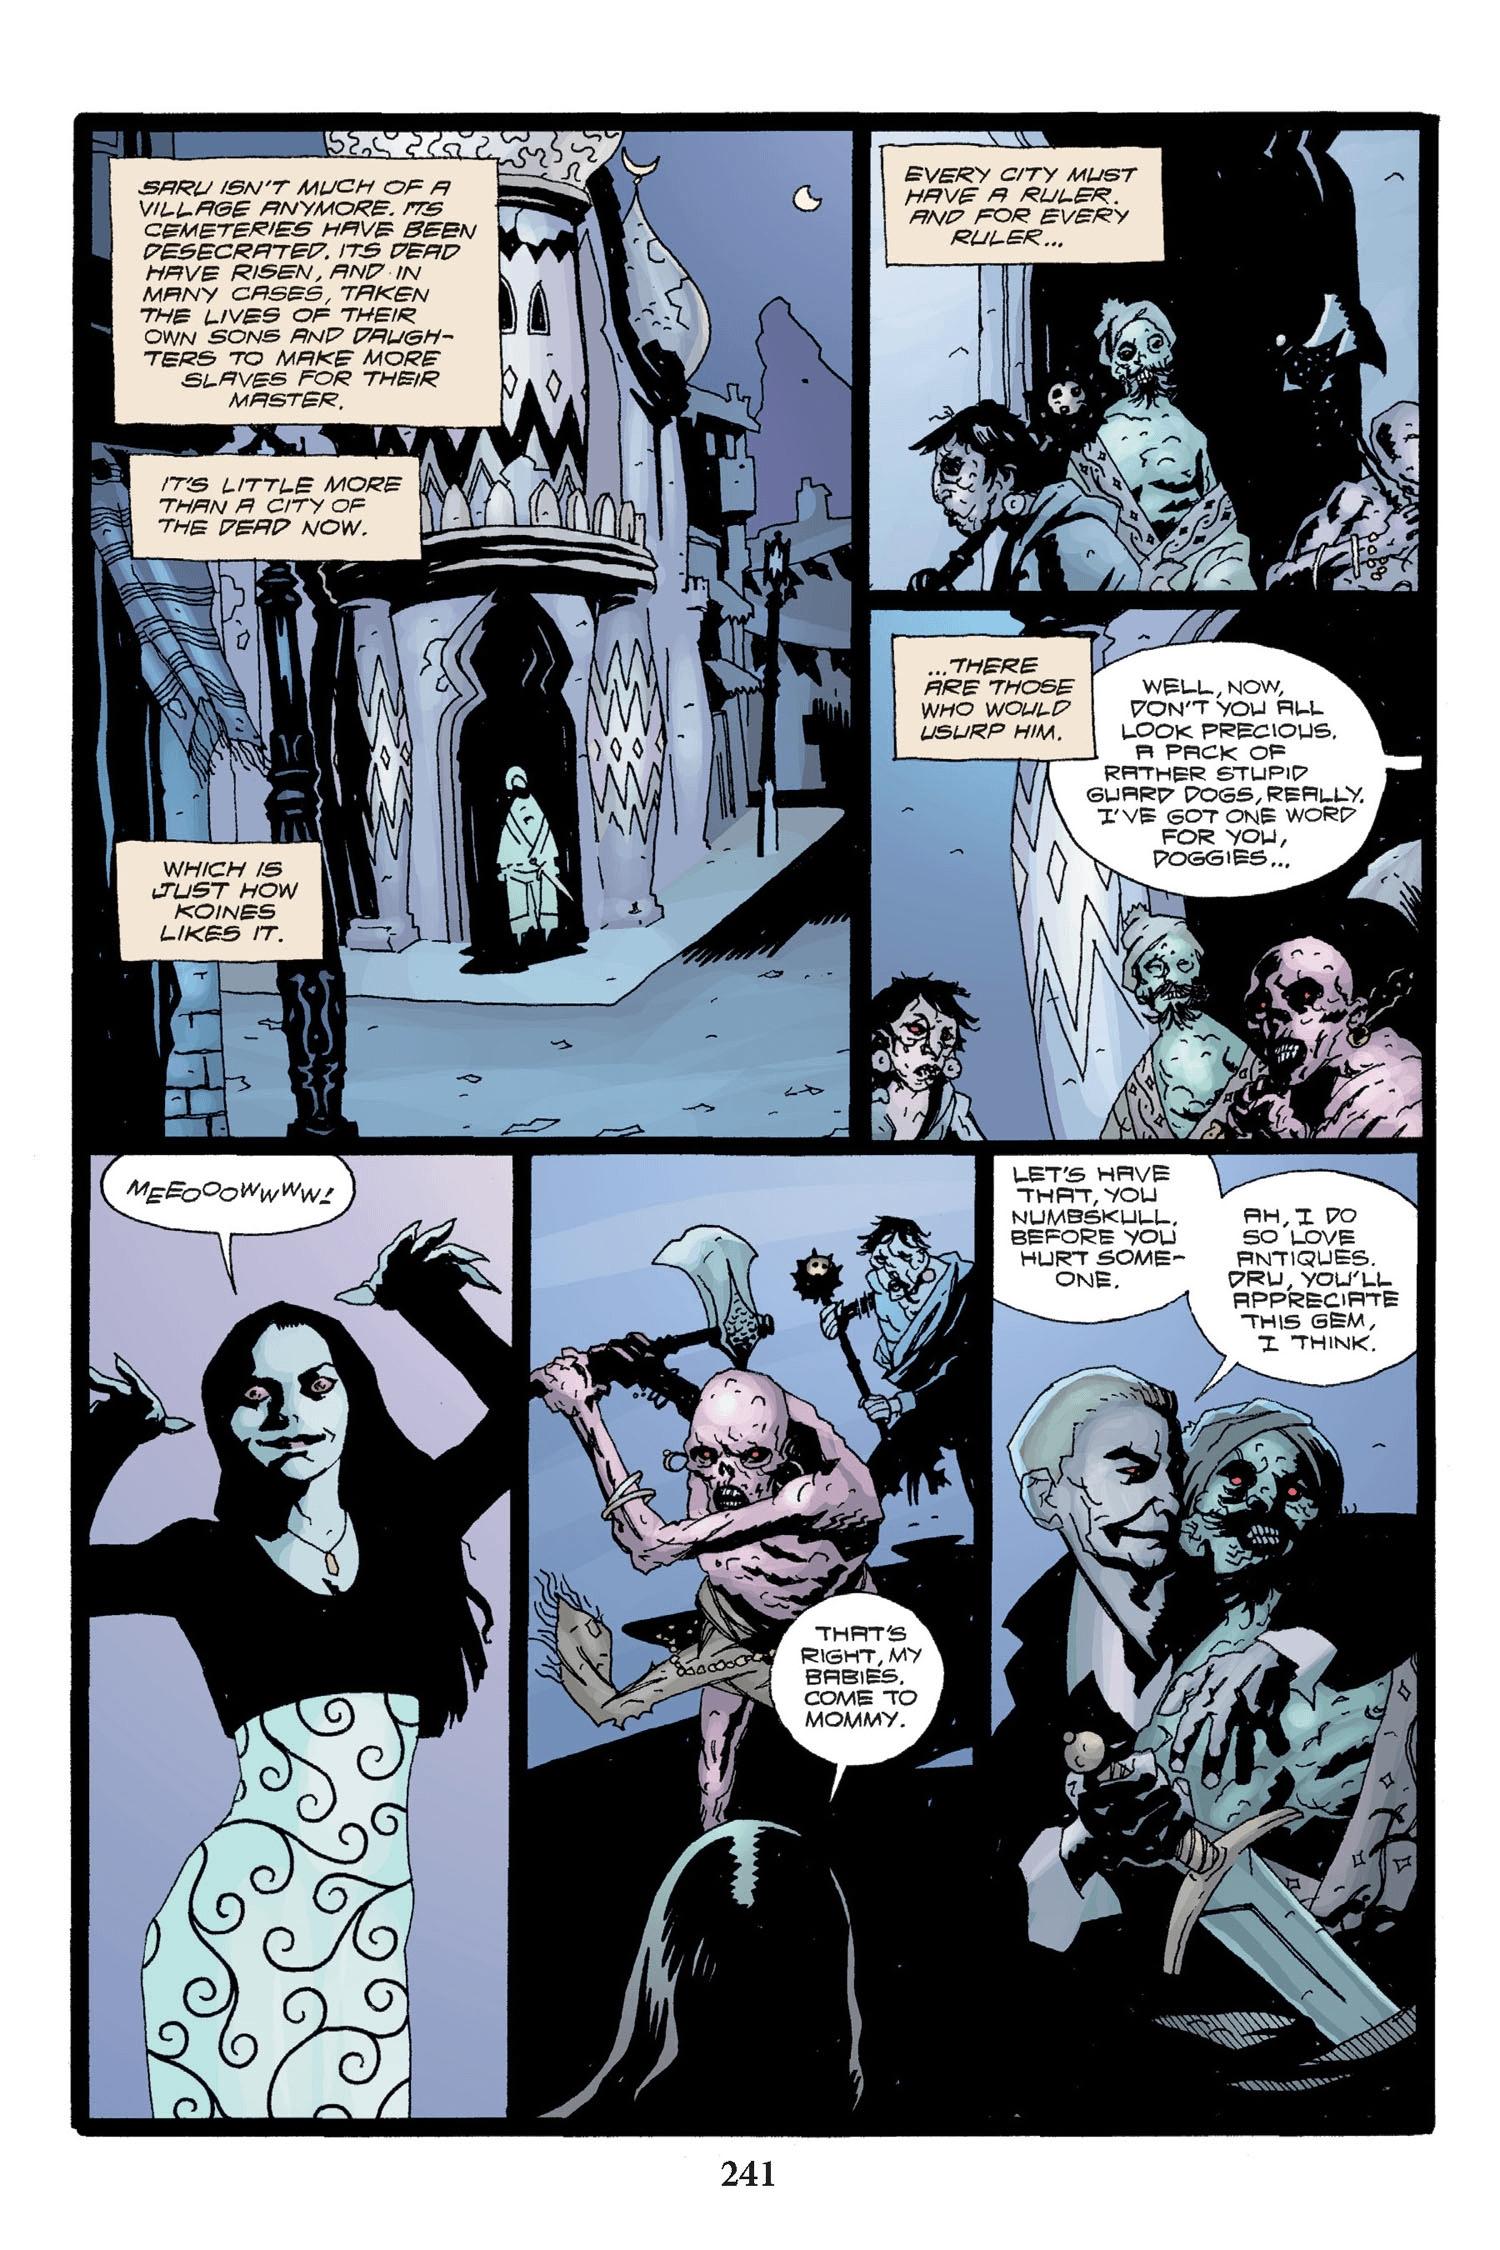 Read online Buffy the Vampire Slayer: Omnibus comic -  Issue # TPB 2 - 234